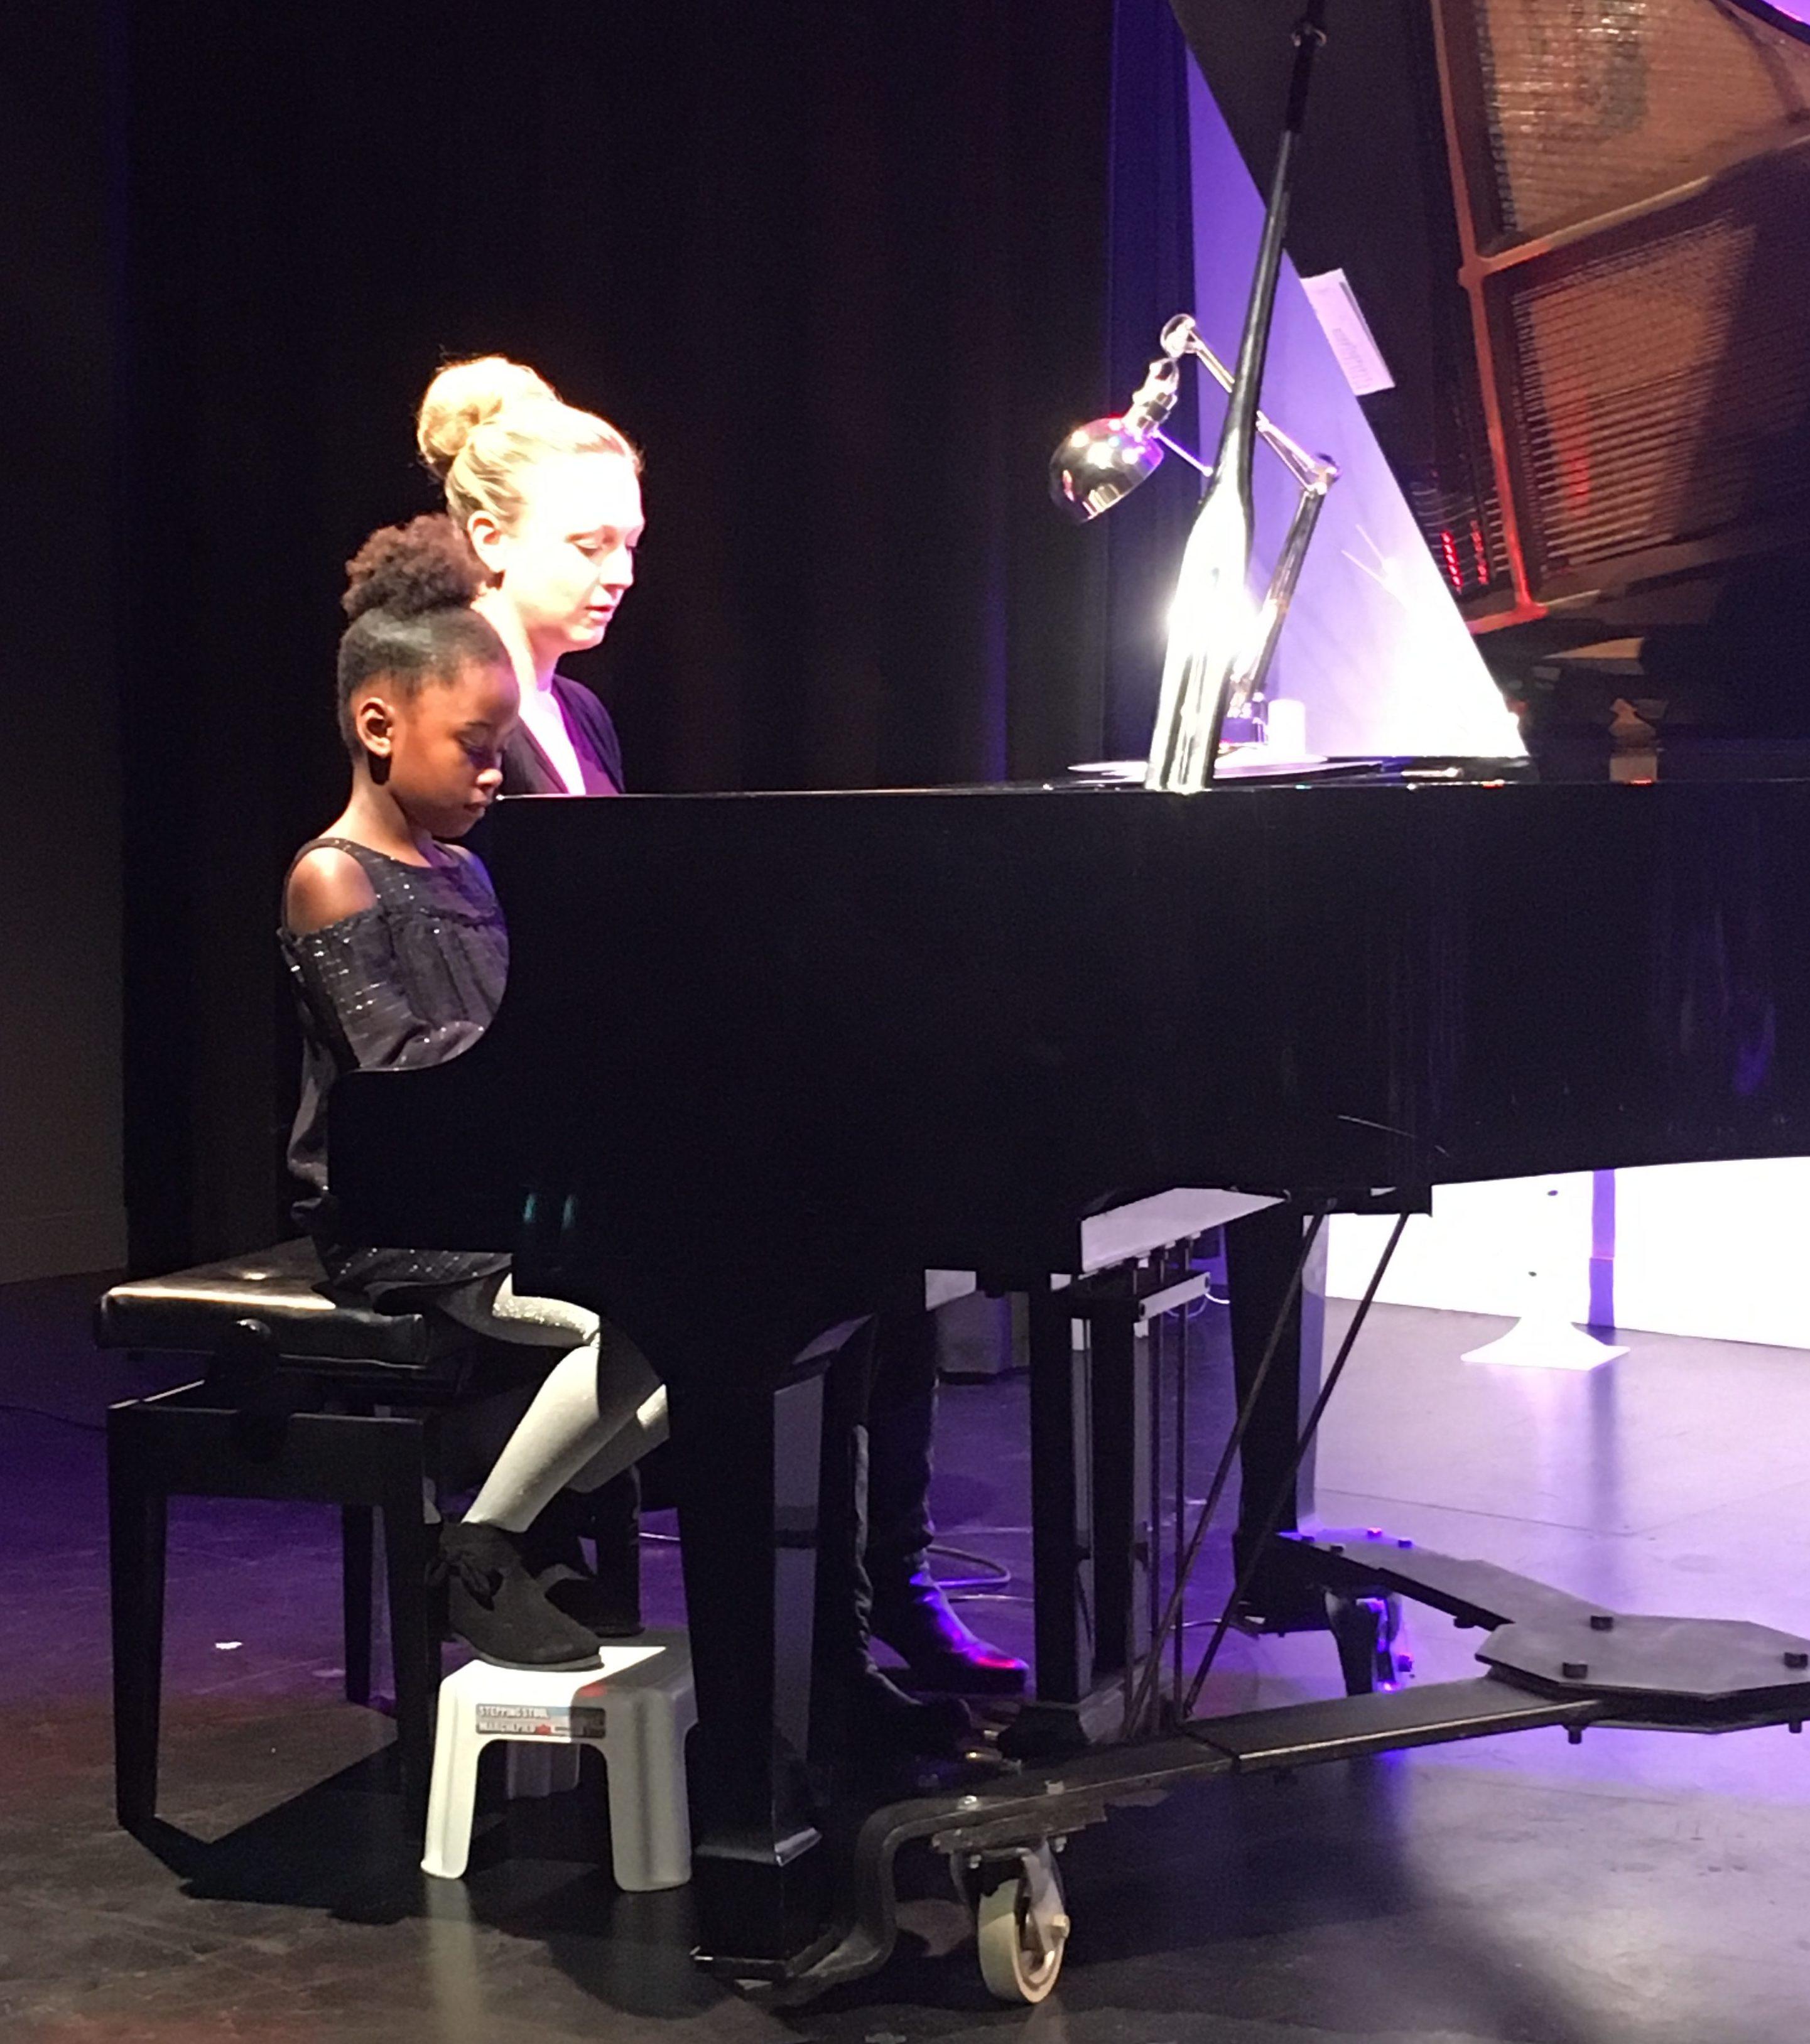 Private Piano Lessons in North York | Bravo Academy